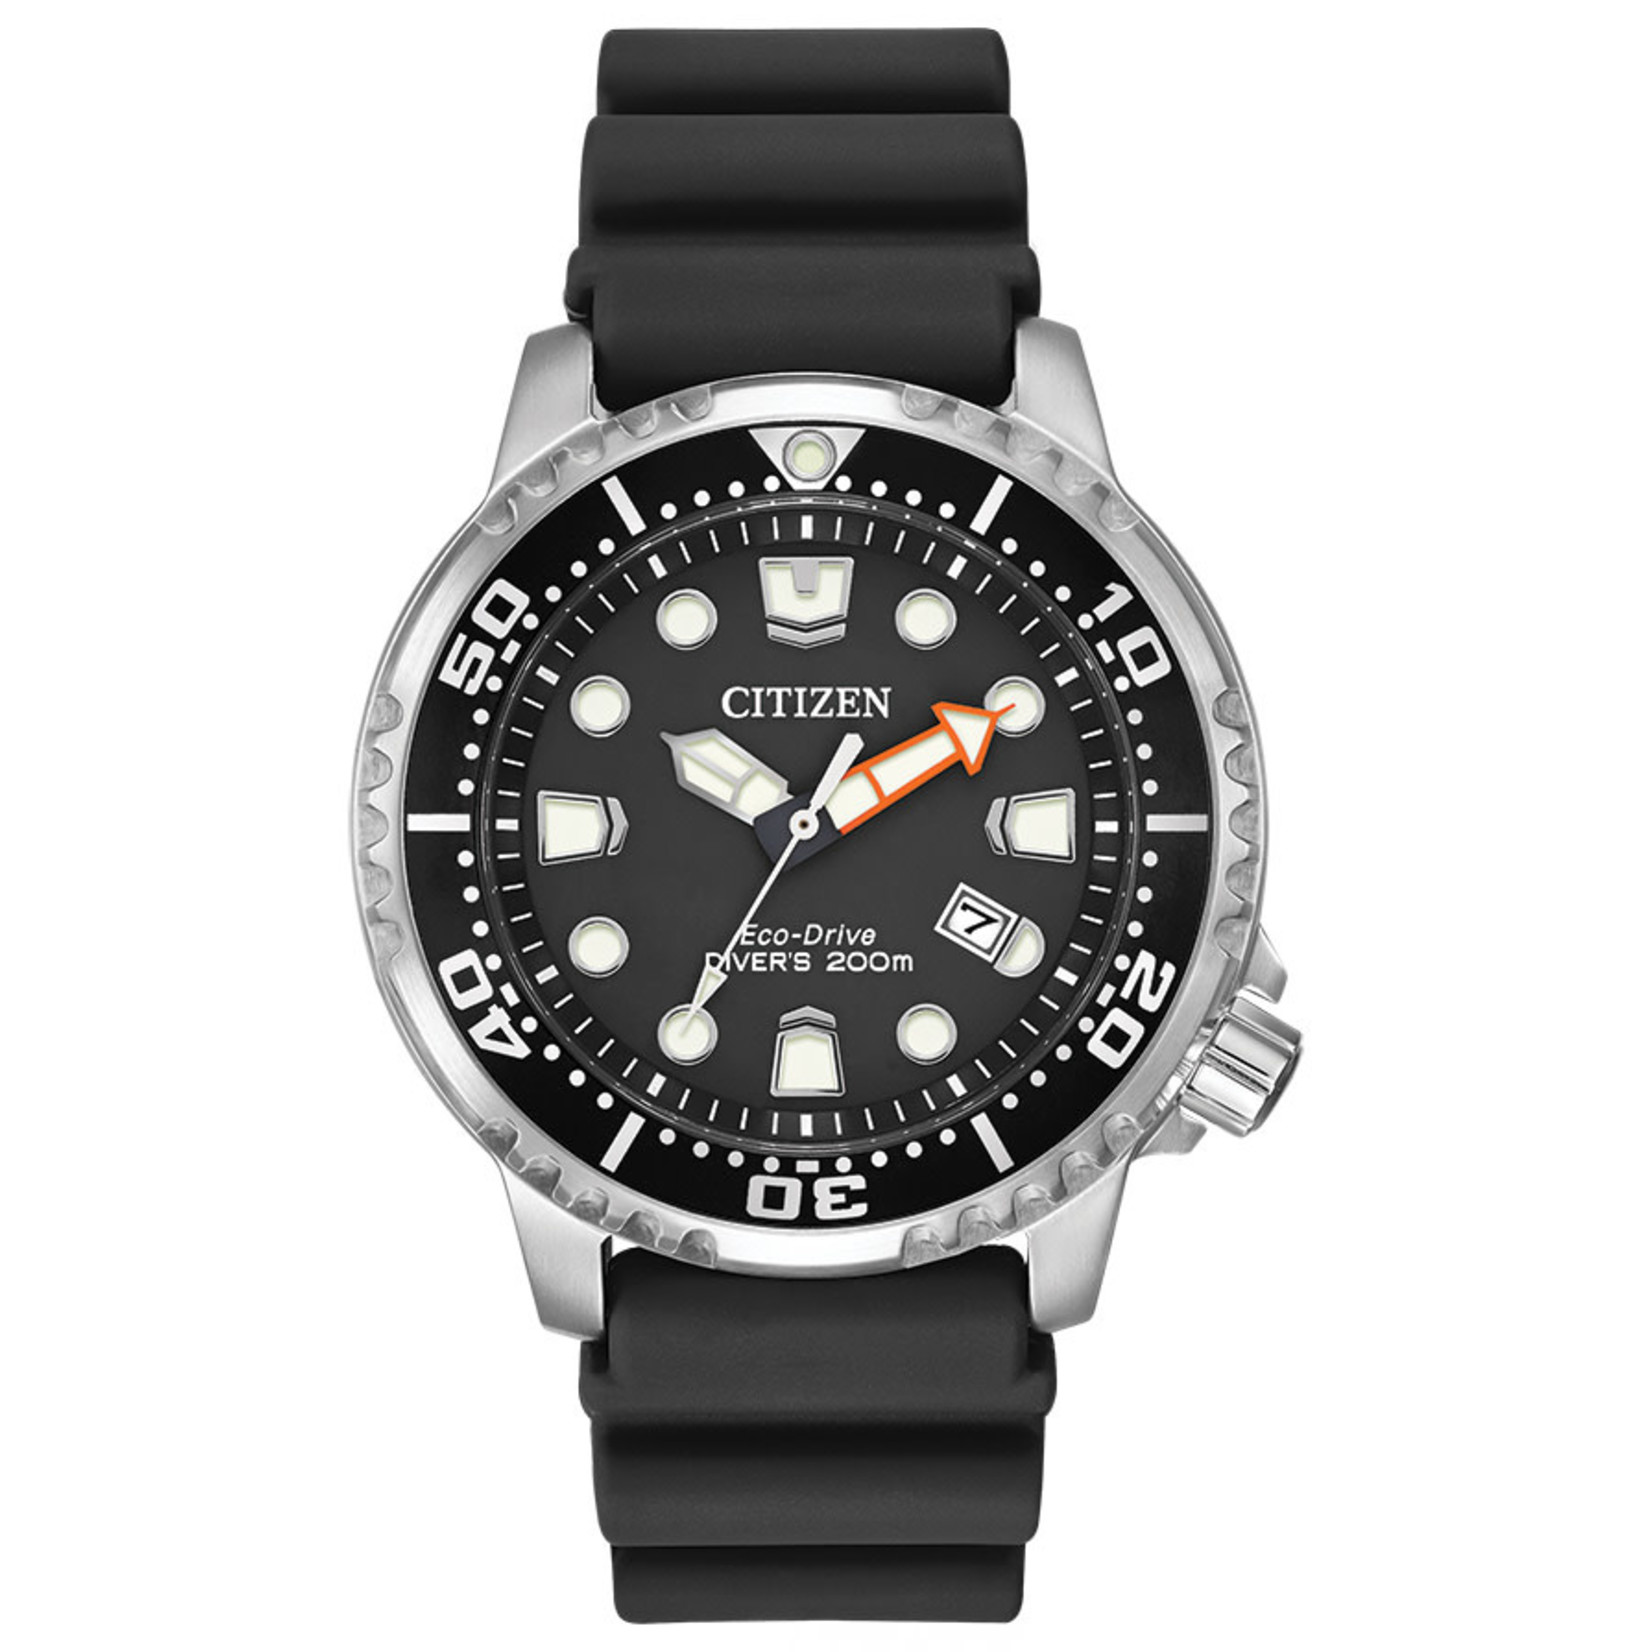 Citizen Citizen Promaster Diver Watch